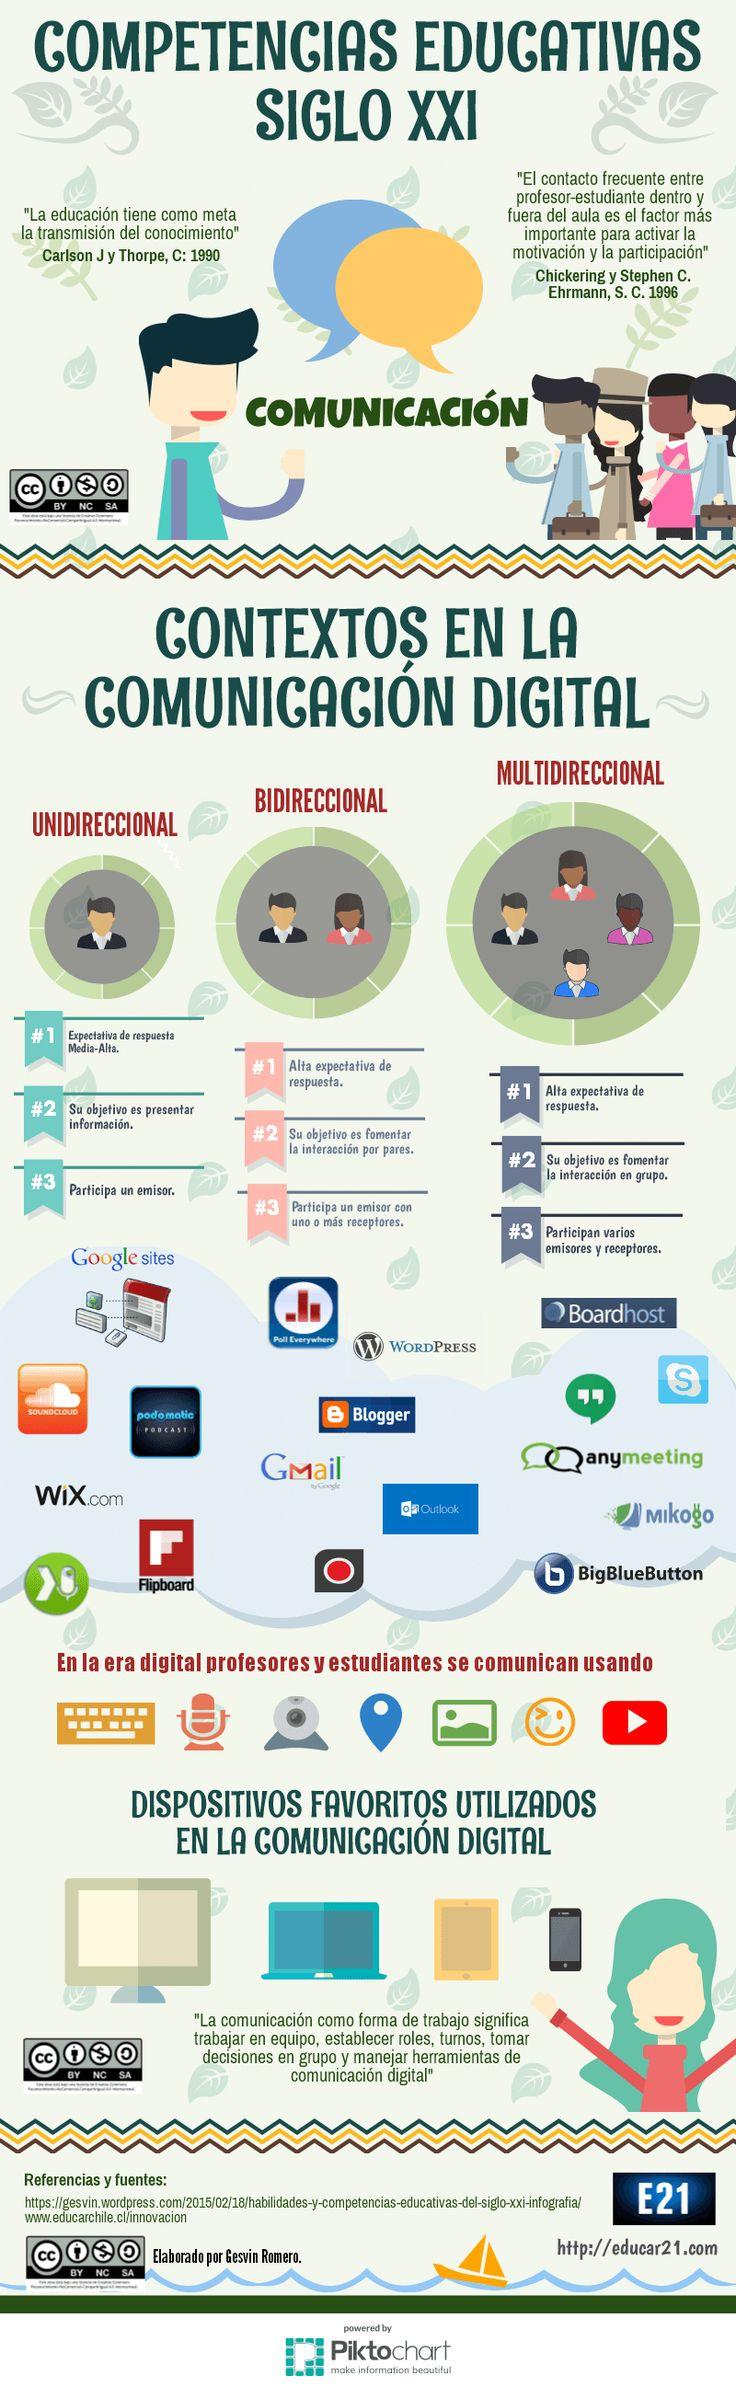 Competencias Educativas del Siglo XXI – Comunicación | #Infografía #Educación